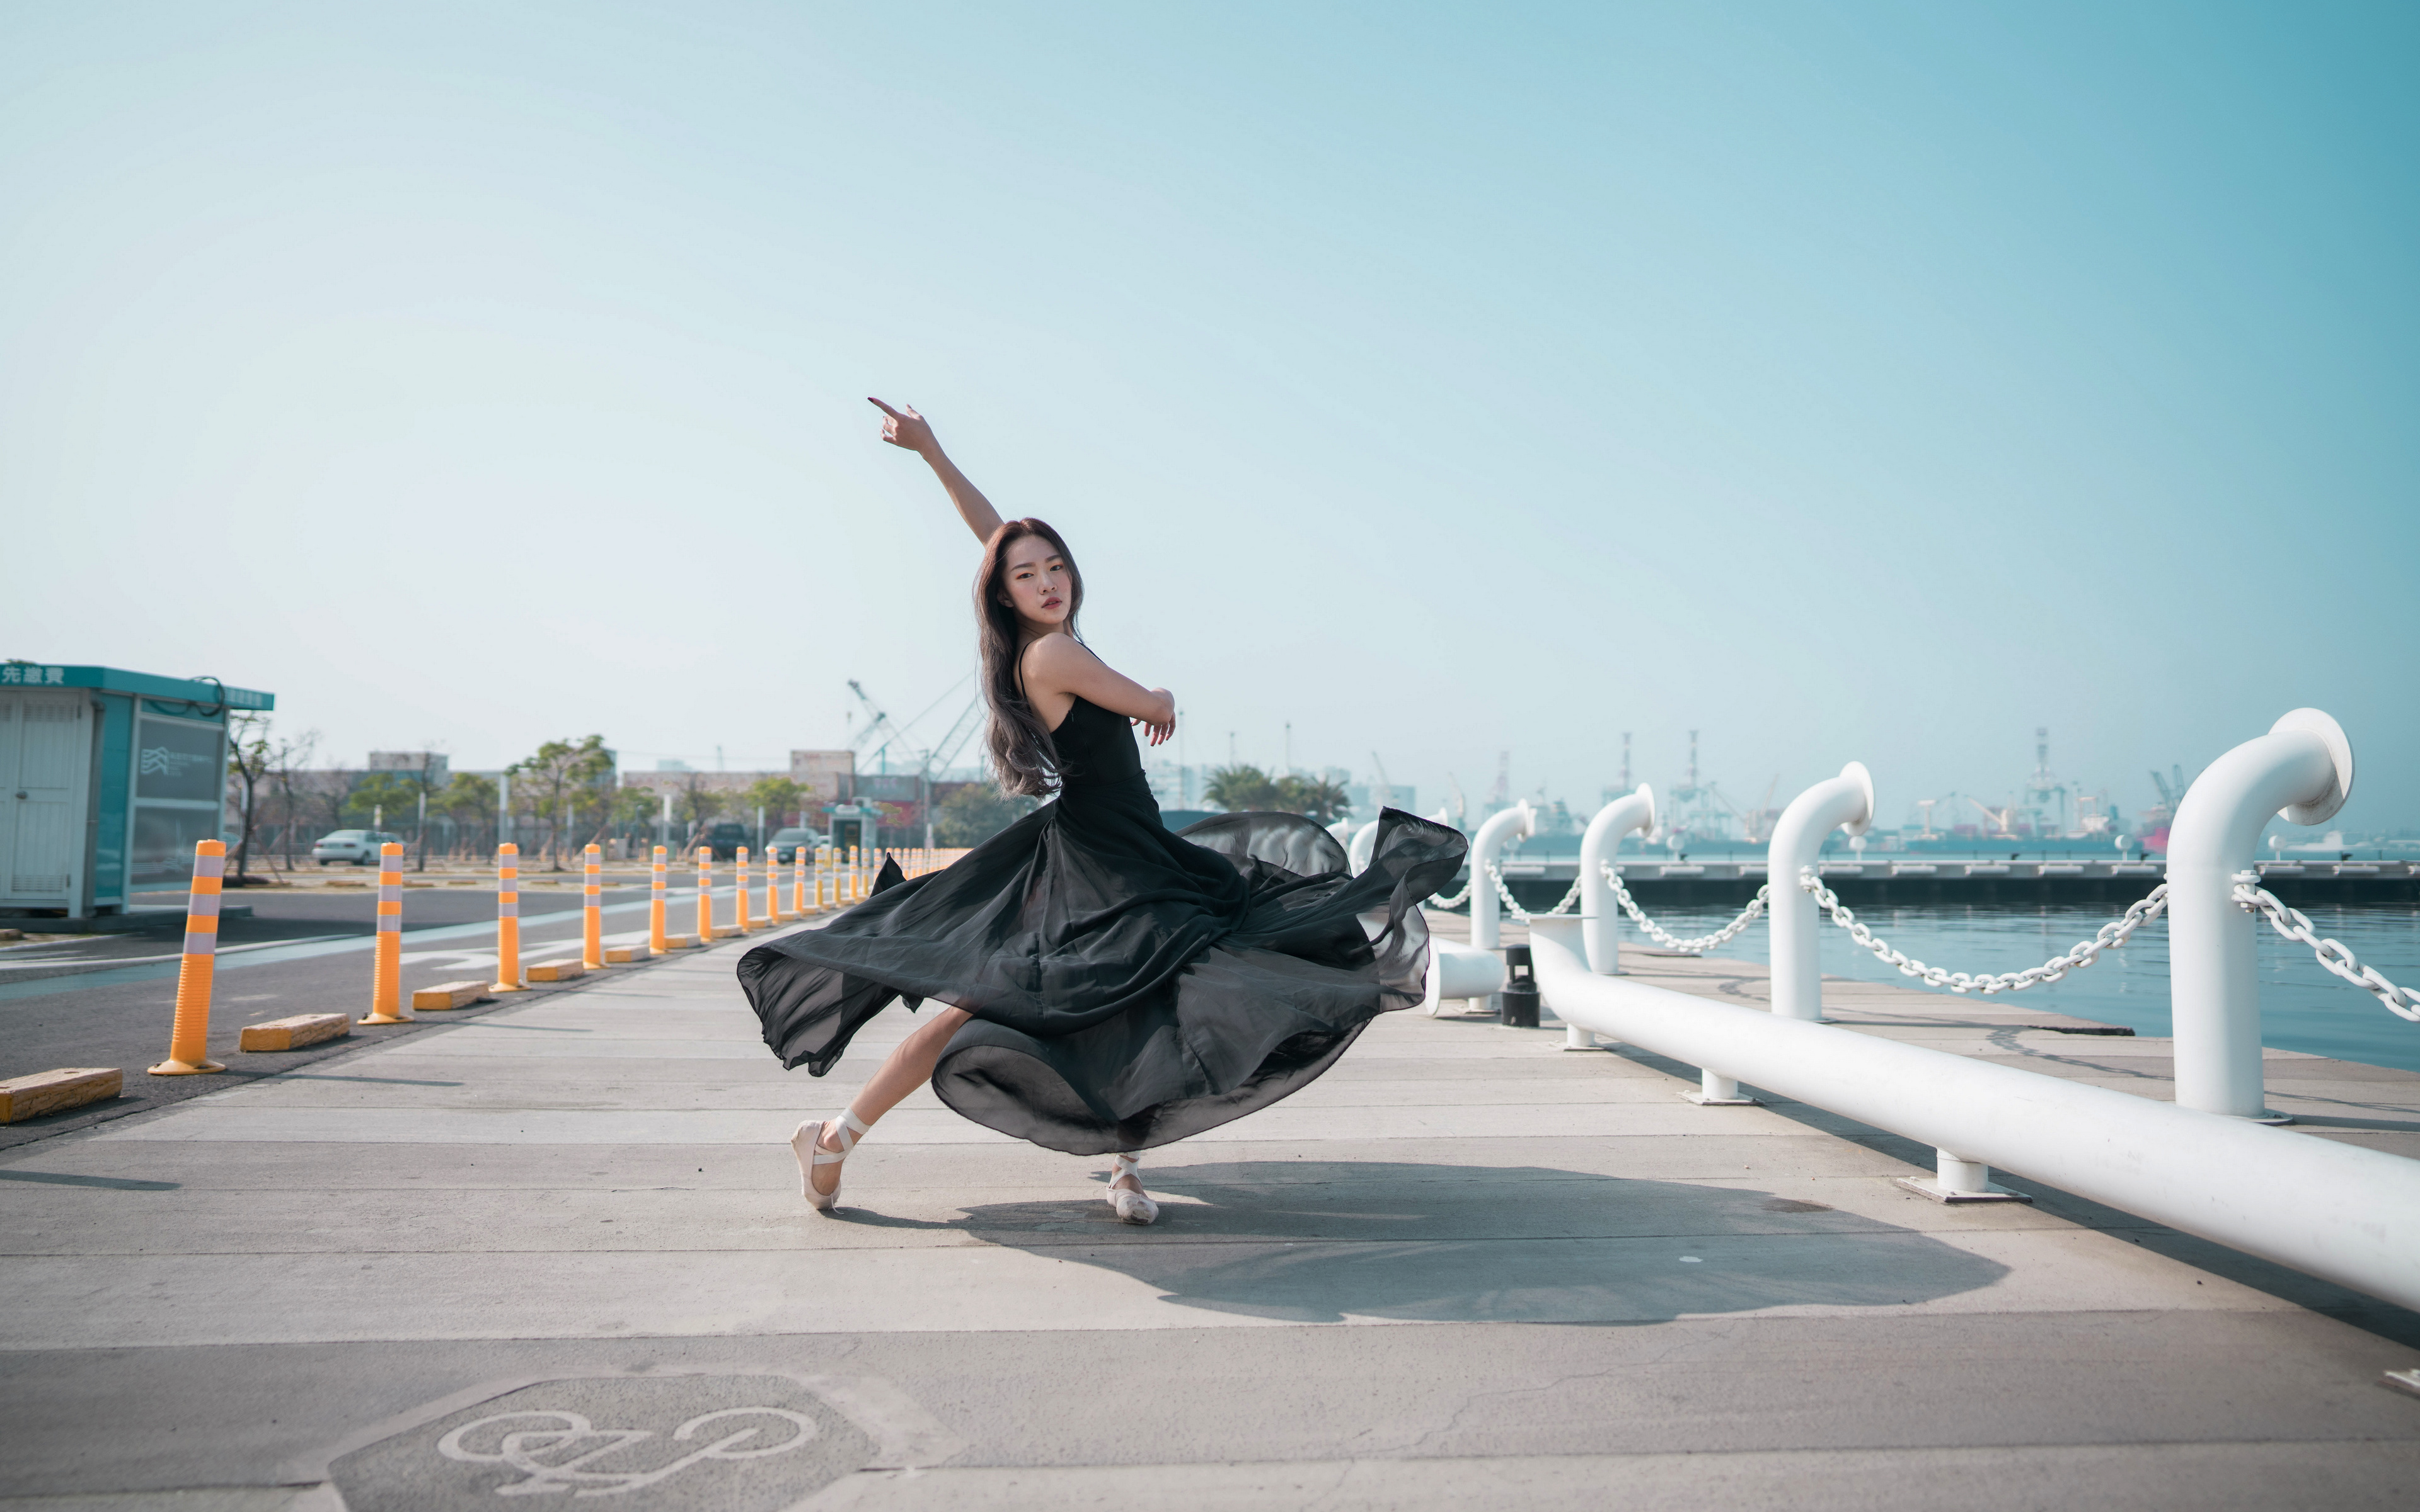 Wallpaper Ballet Dancing Girls Asiatic Waterfront Dress 3840x2400 Dance female young woman Asian gown frock